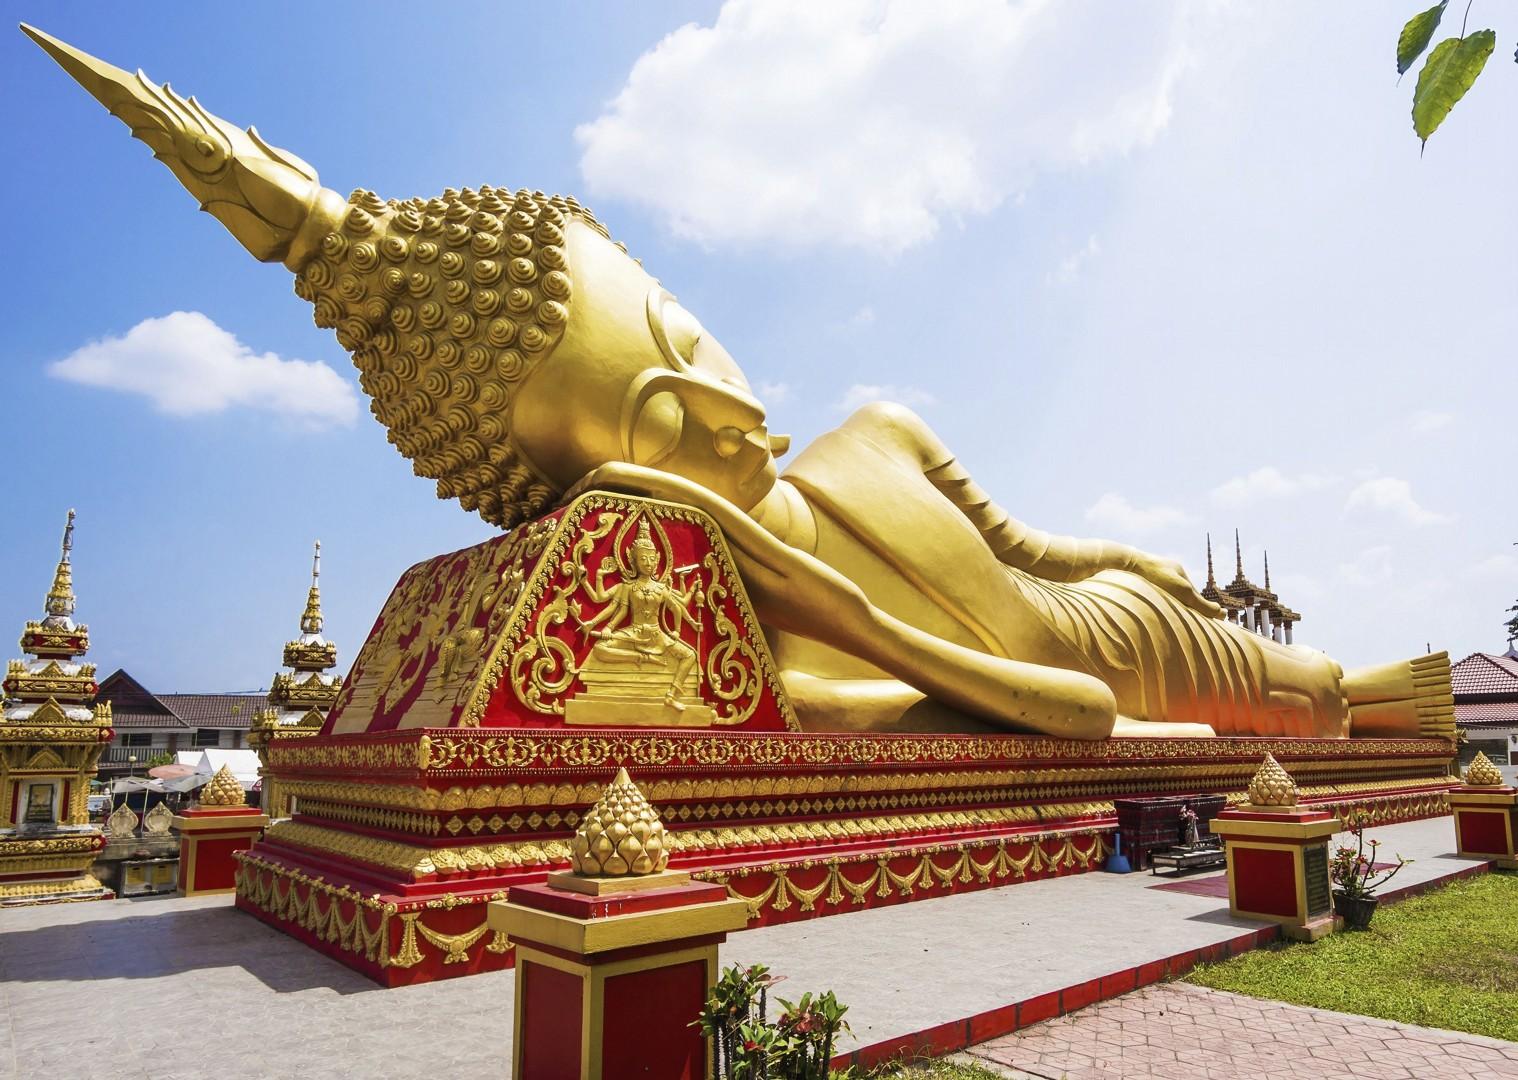 cycling-adventure-laus-WatPhaThatLuang-Vientiane.jpg - Laos - Hidden Treasures - Cycling Adventures